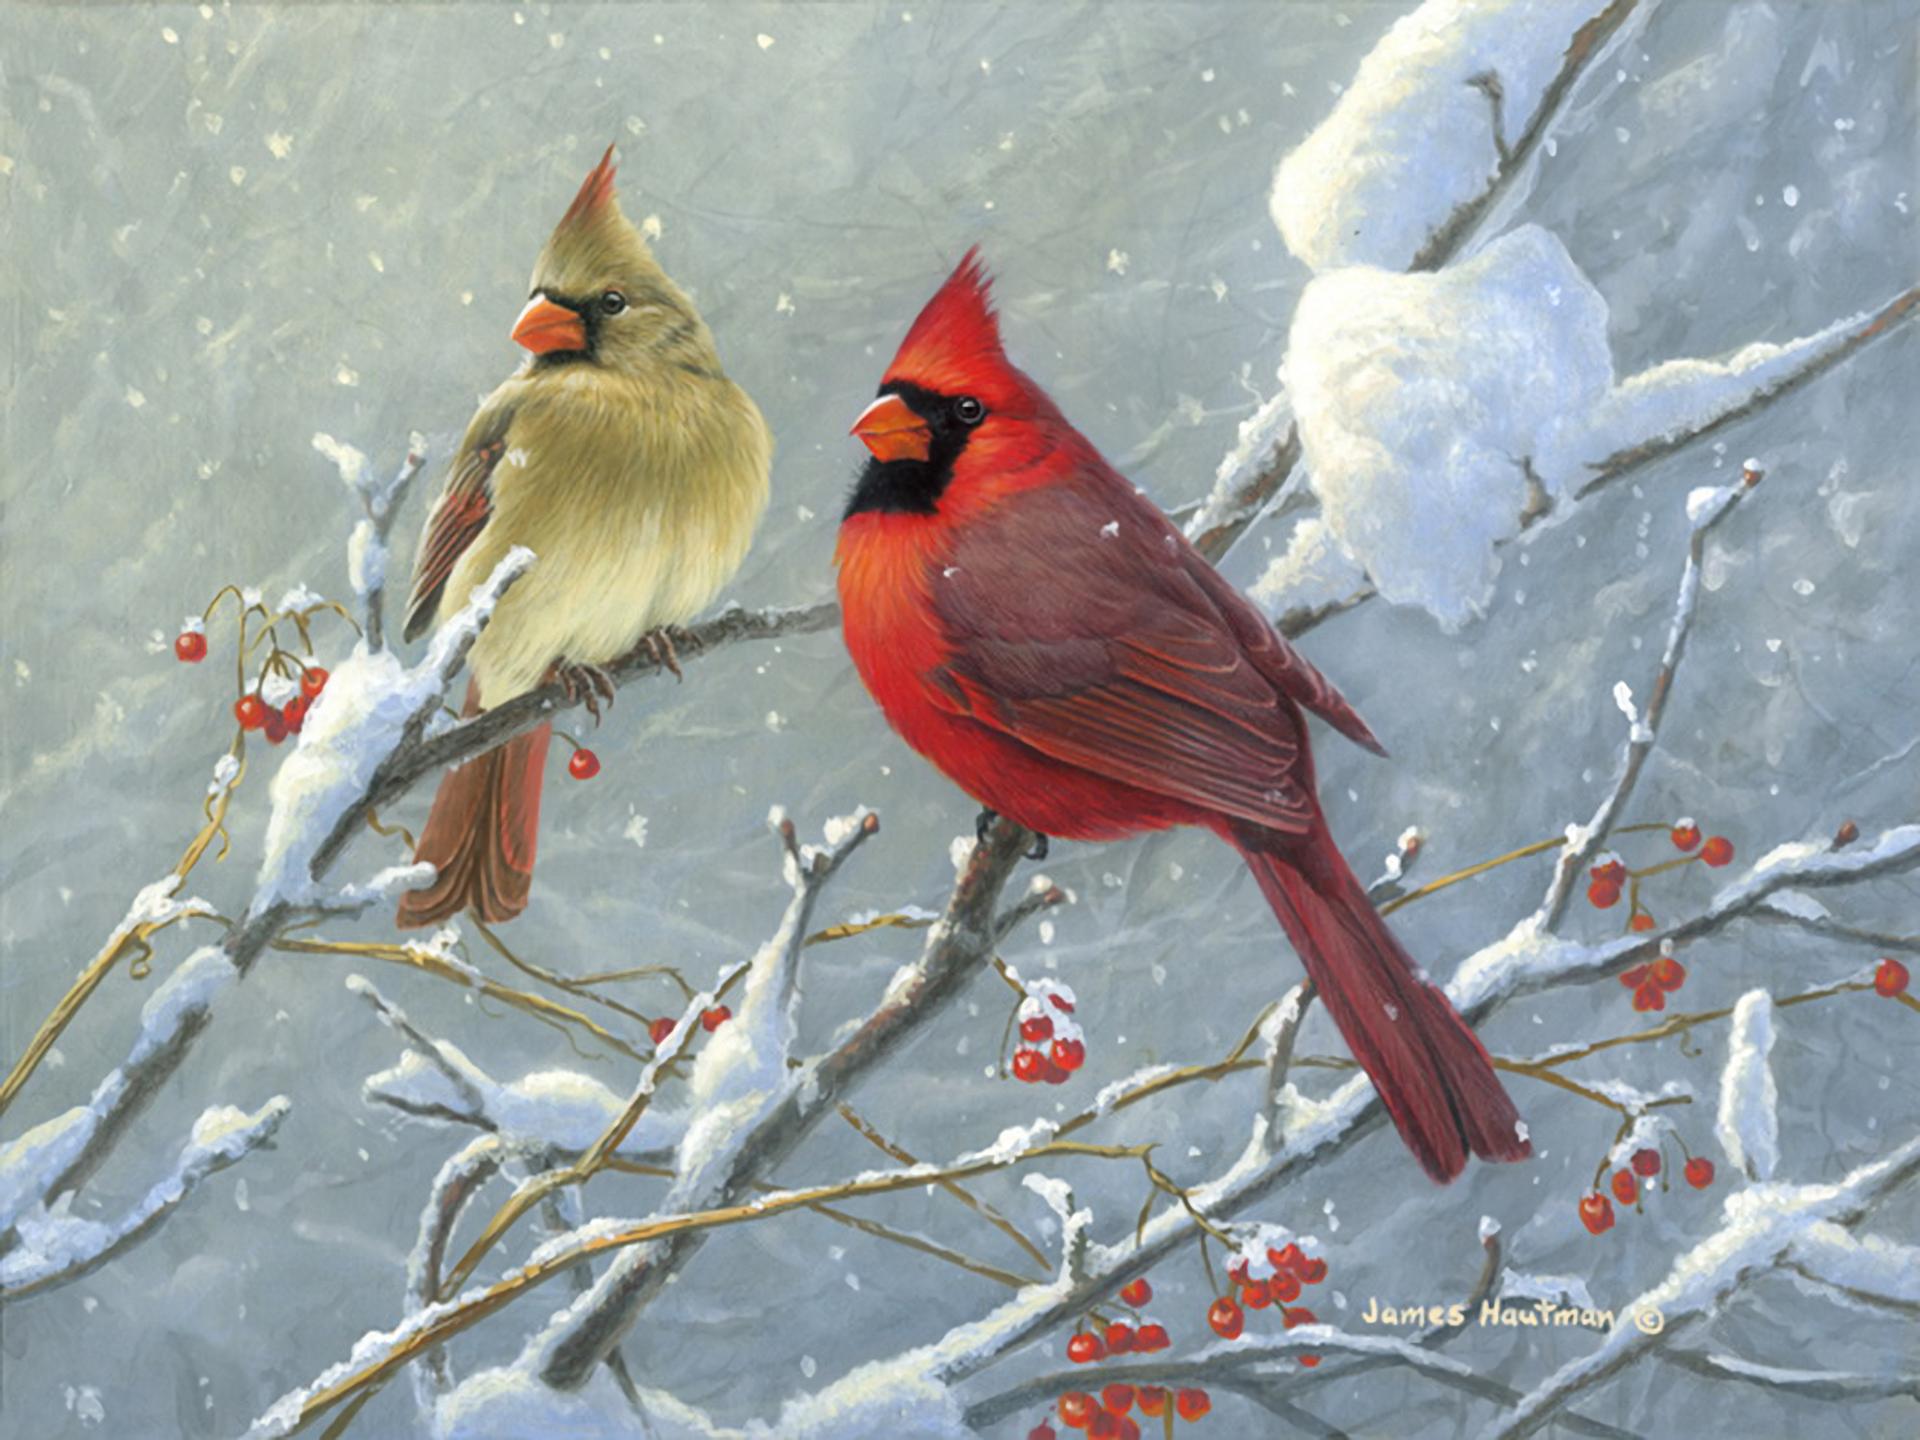 Cardinals on winter branch hd wallpaper background image - Winter cardinal wallpaper ...